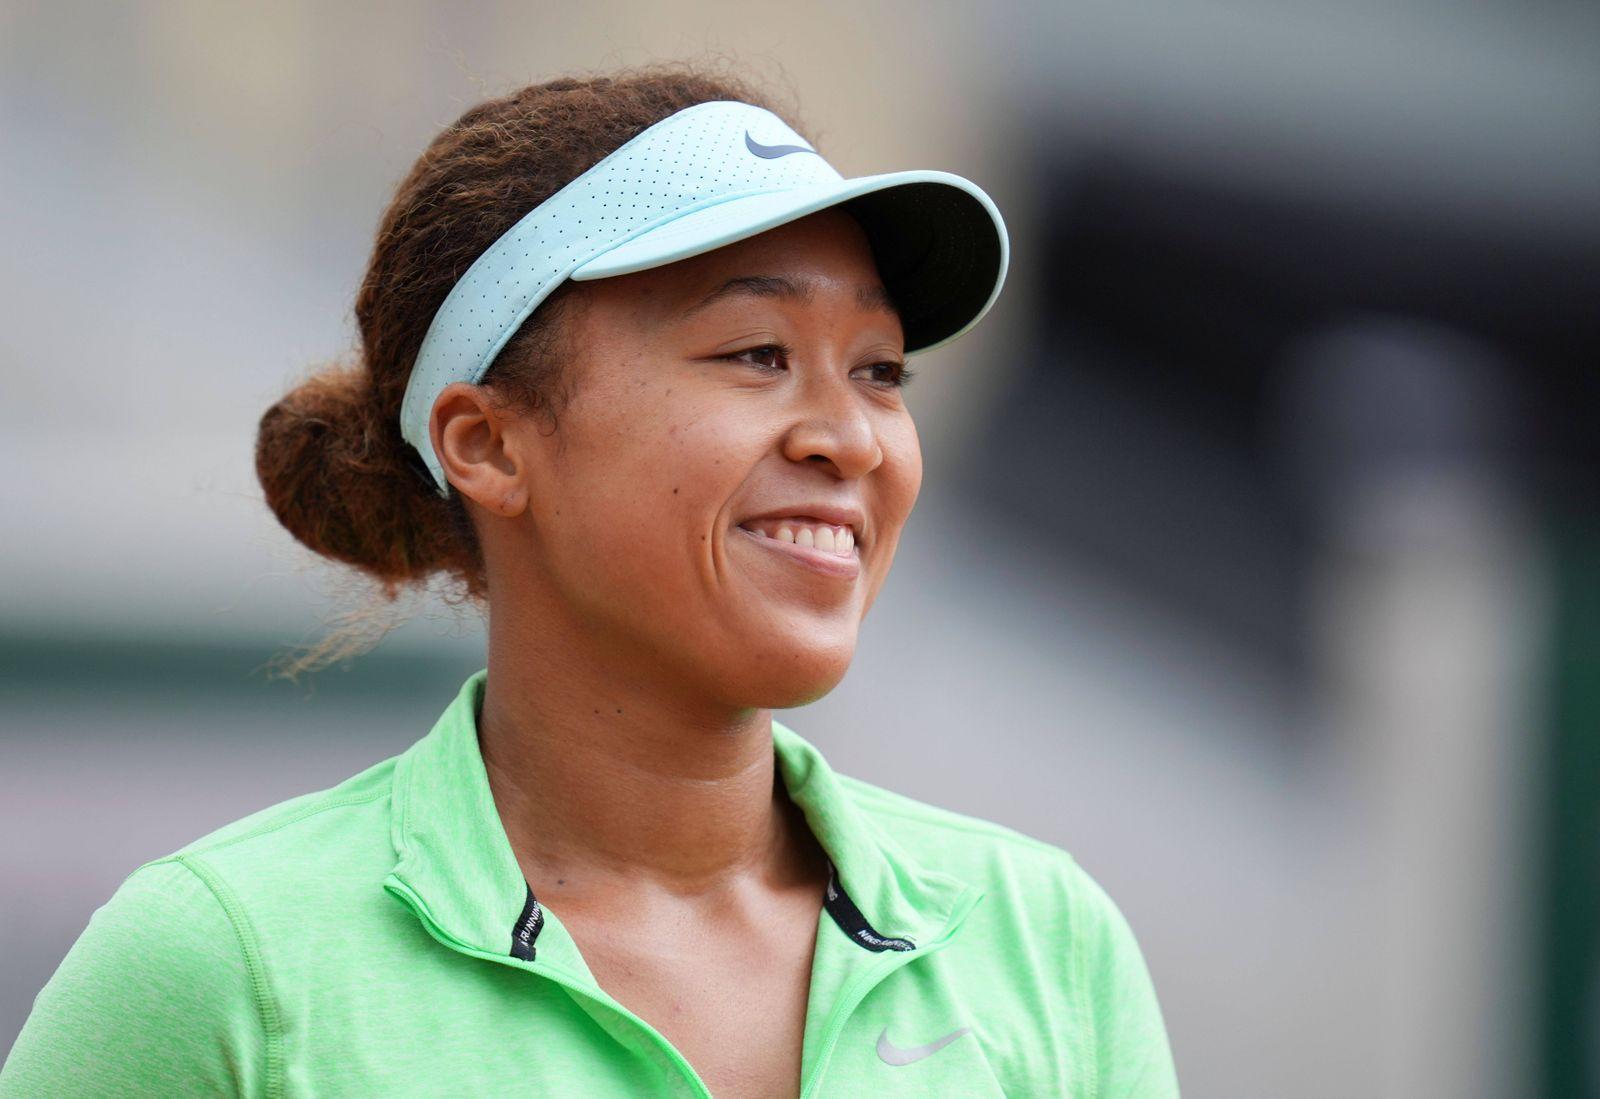 Mandatory Credit: Photo by Javier Grcia/BPI/Shutterstock (11970508bi) Naomi Osaka of Japan smiles French Open Tennis, Tu